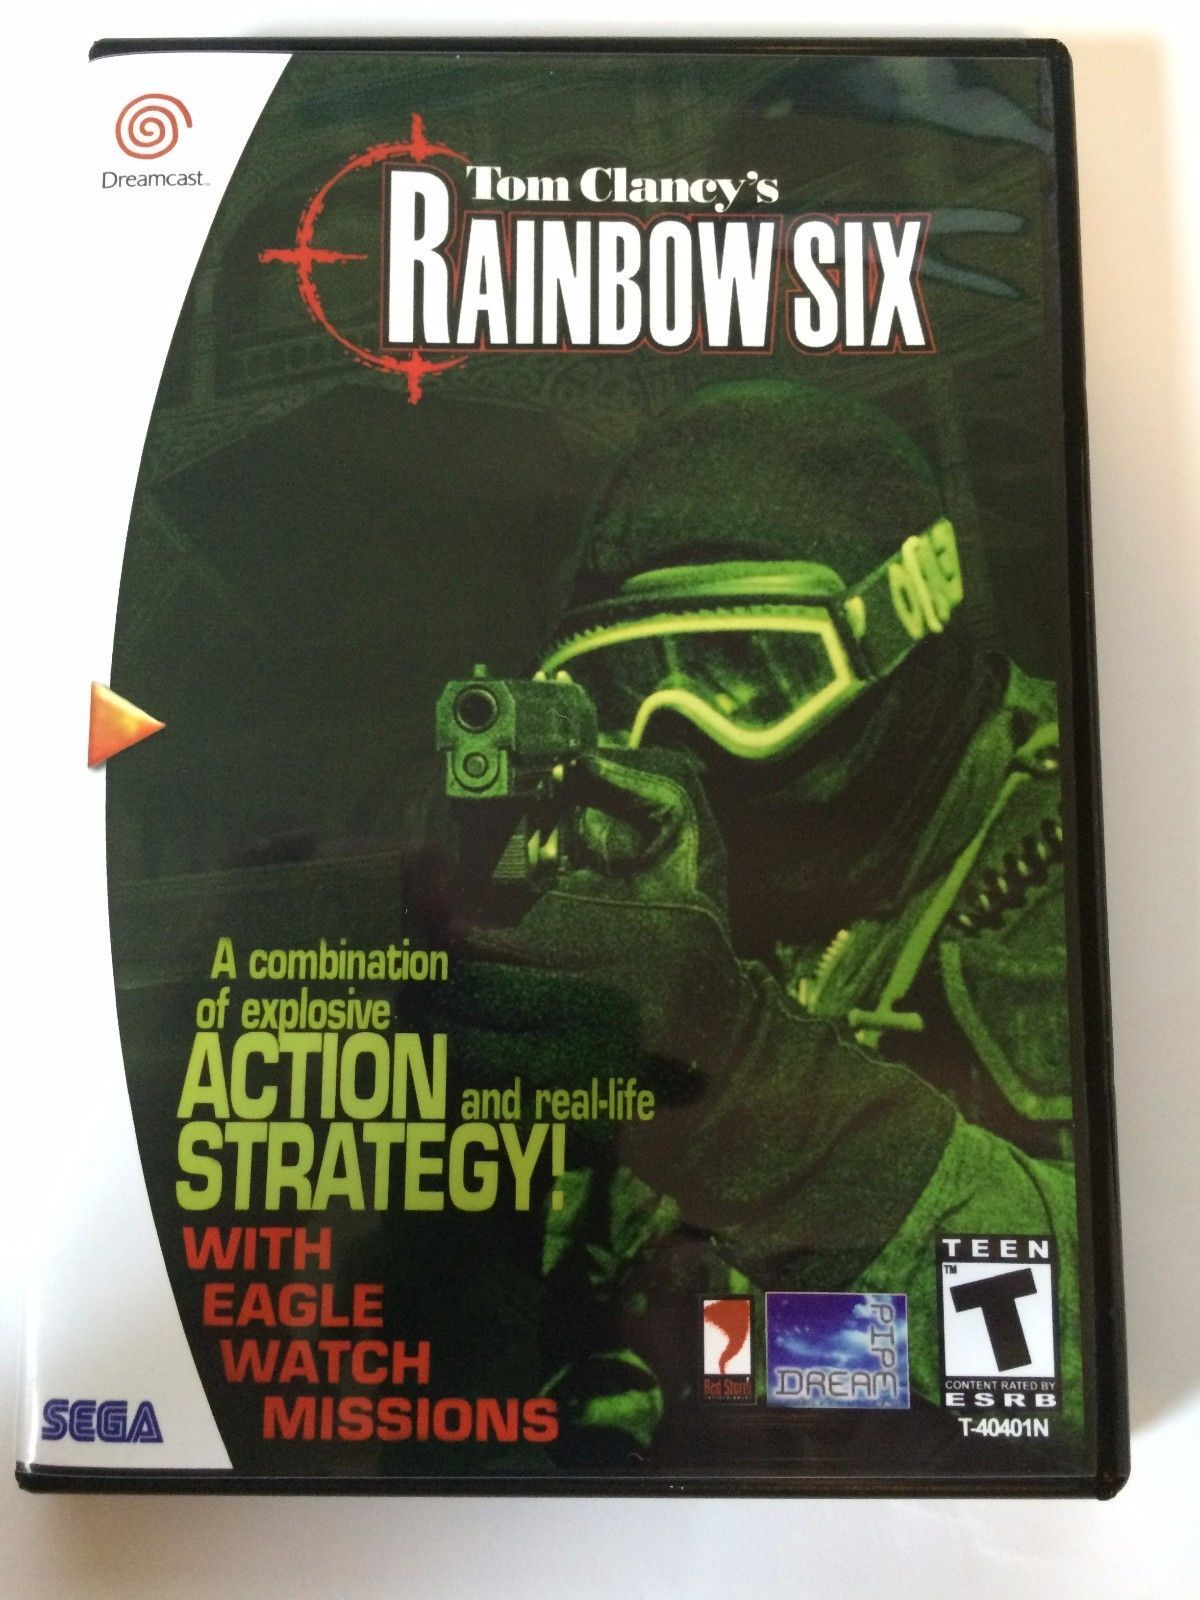 Rainbow Six - Sega Dreamcast - Replacement Case - No Game